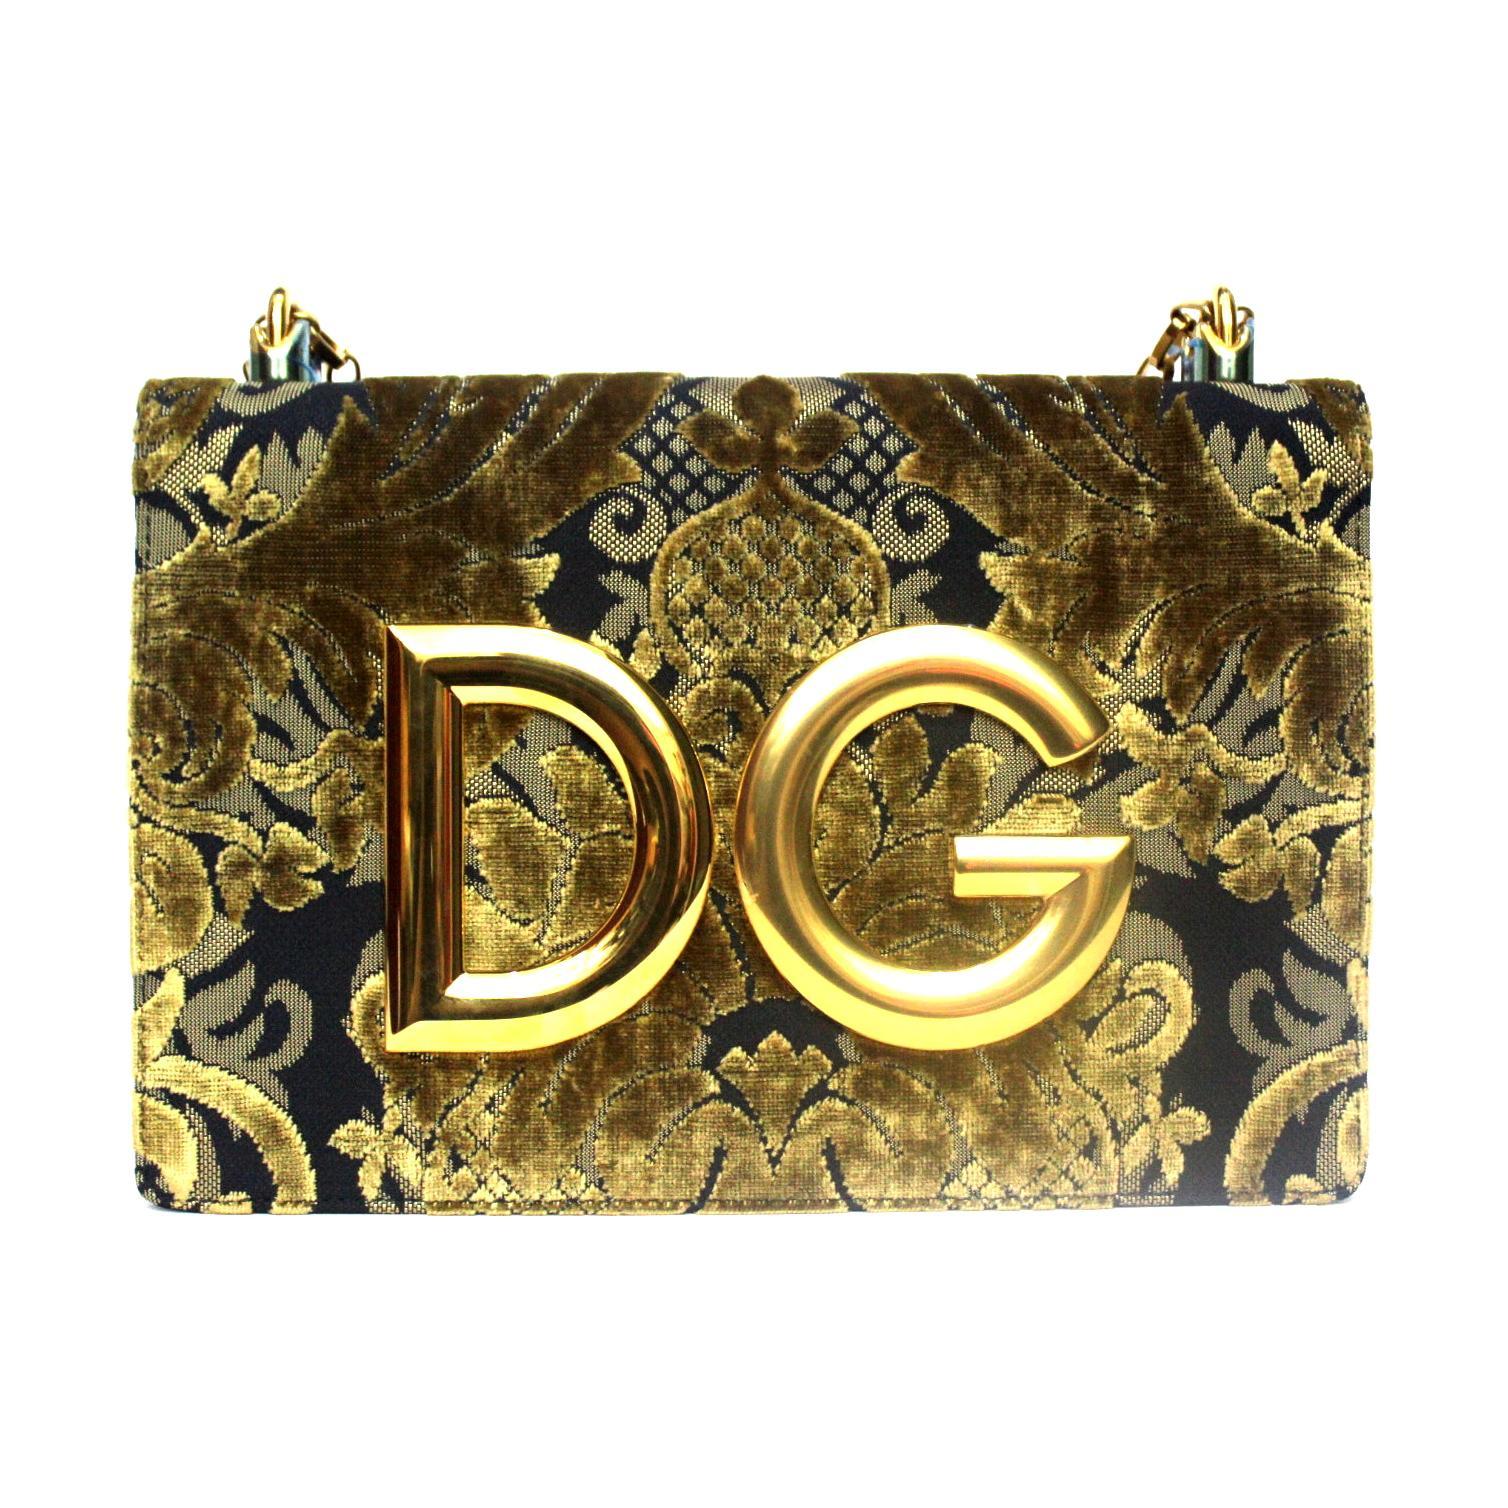 Dolce & Gabbana Gold/Black Damask Girls Bag